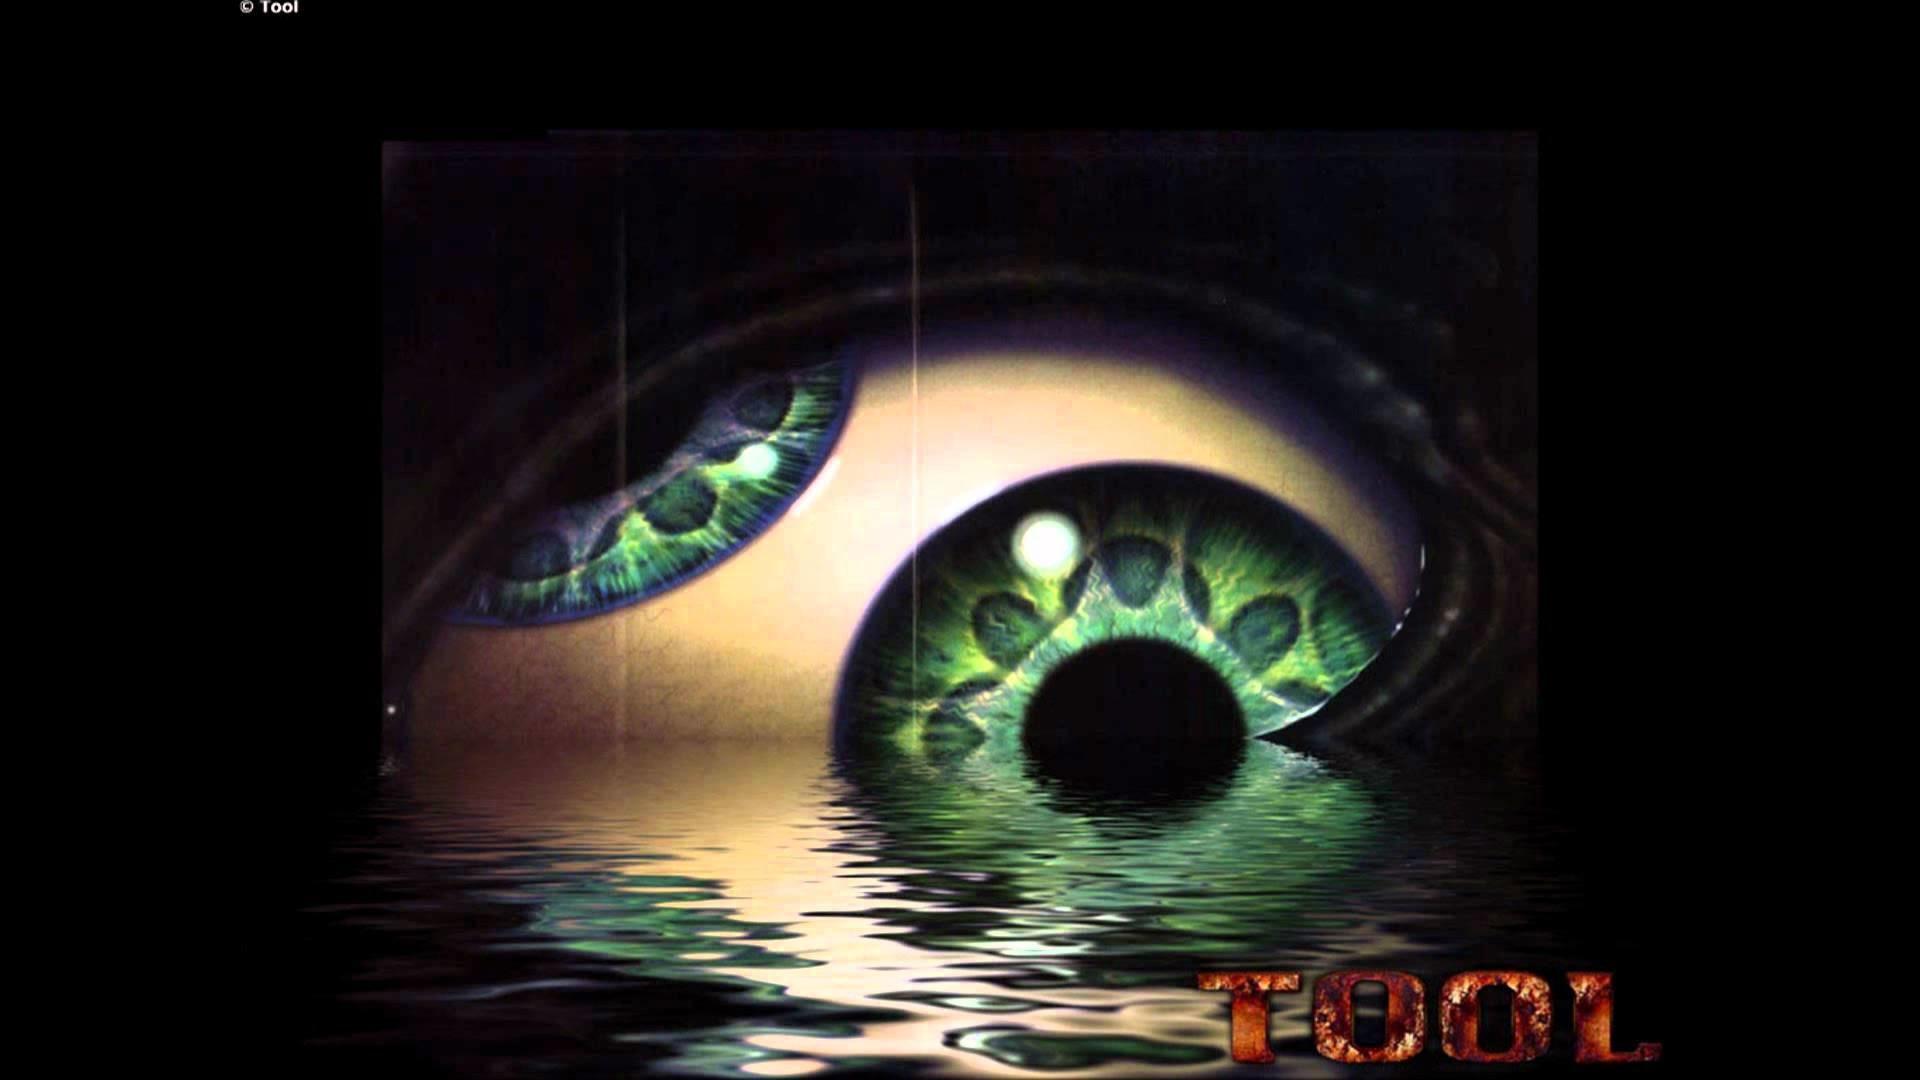 Tool – Ænima